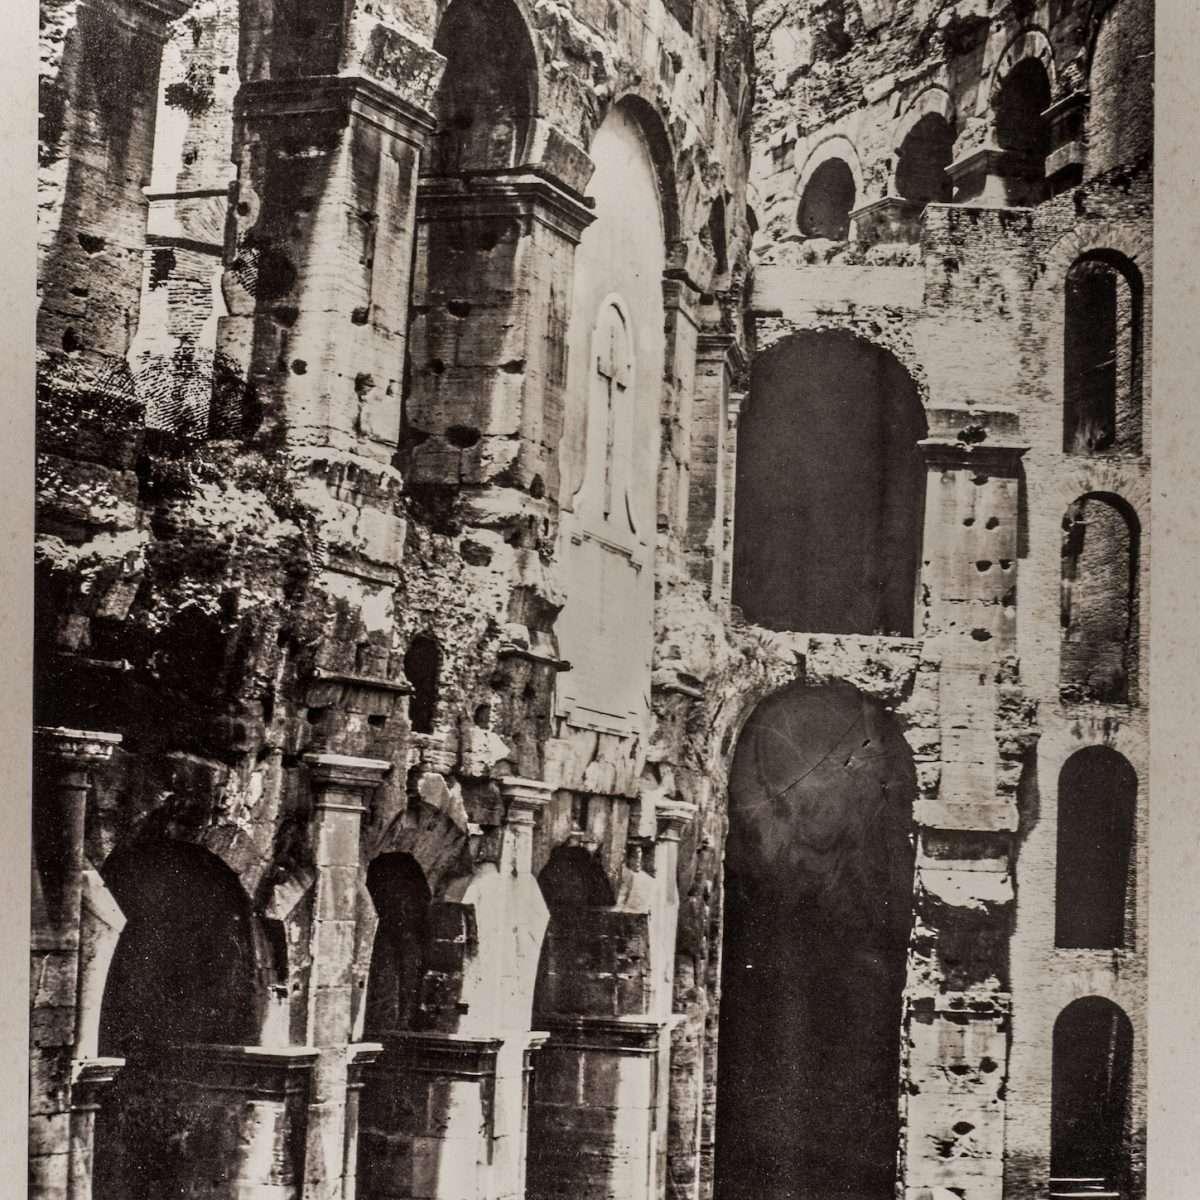 L-1090178 - Colosseo